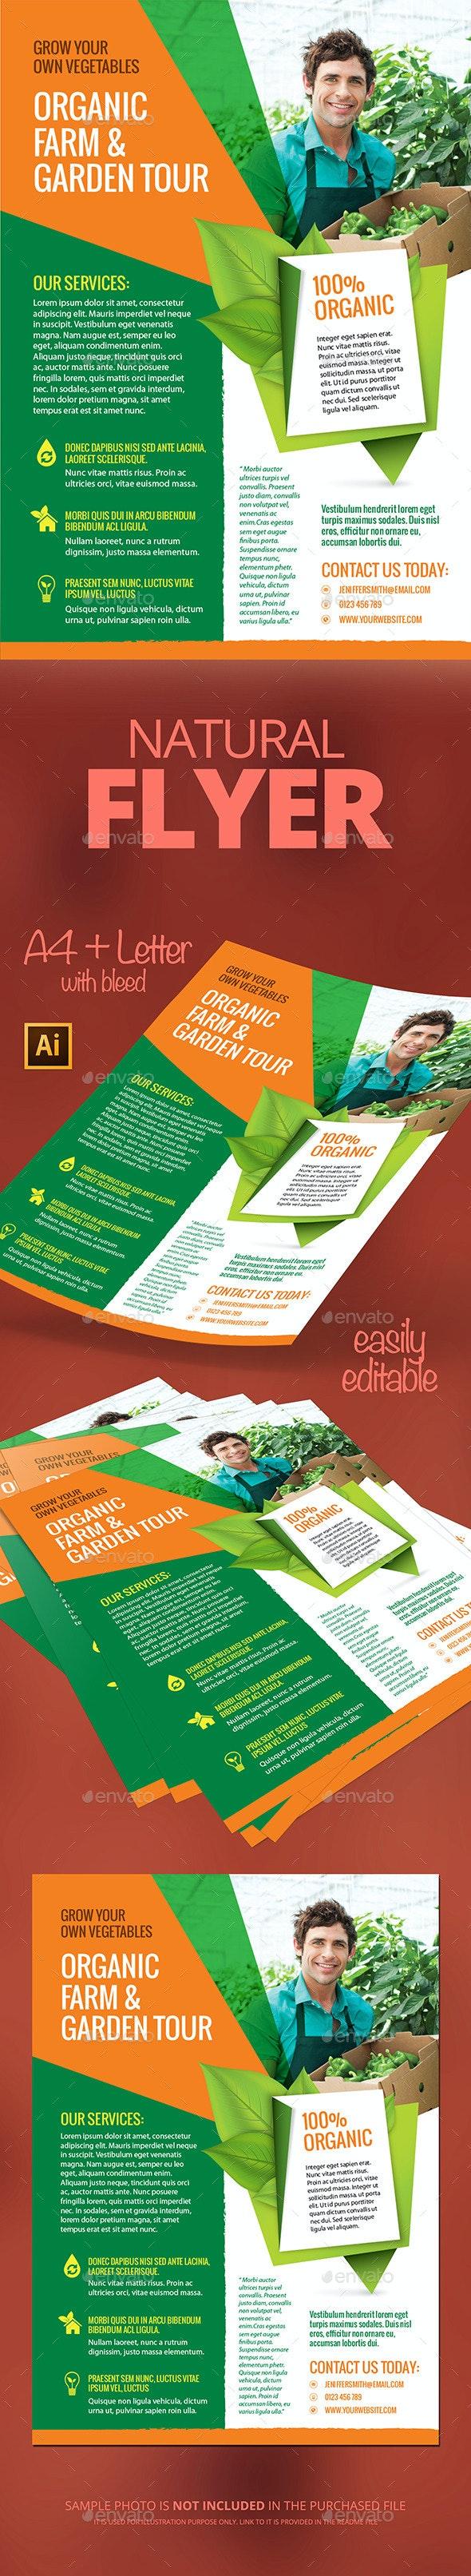 Natural Flyer  - Flyers Print Templates